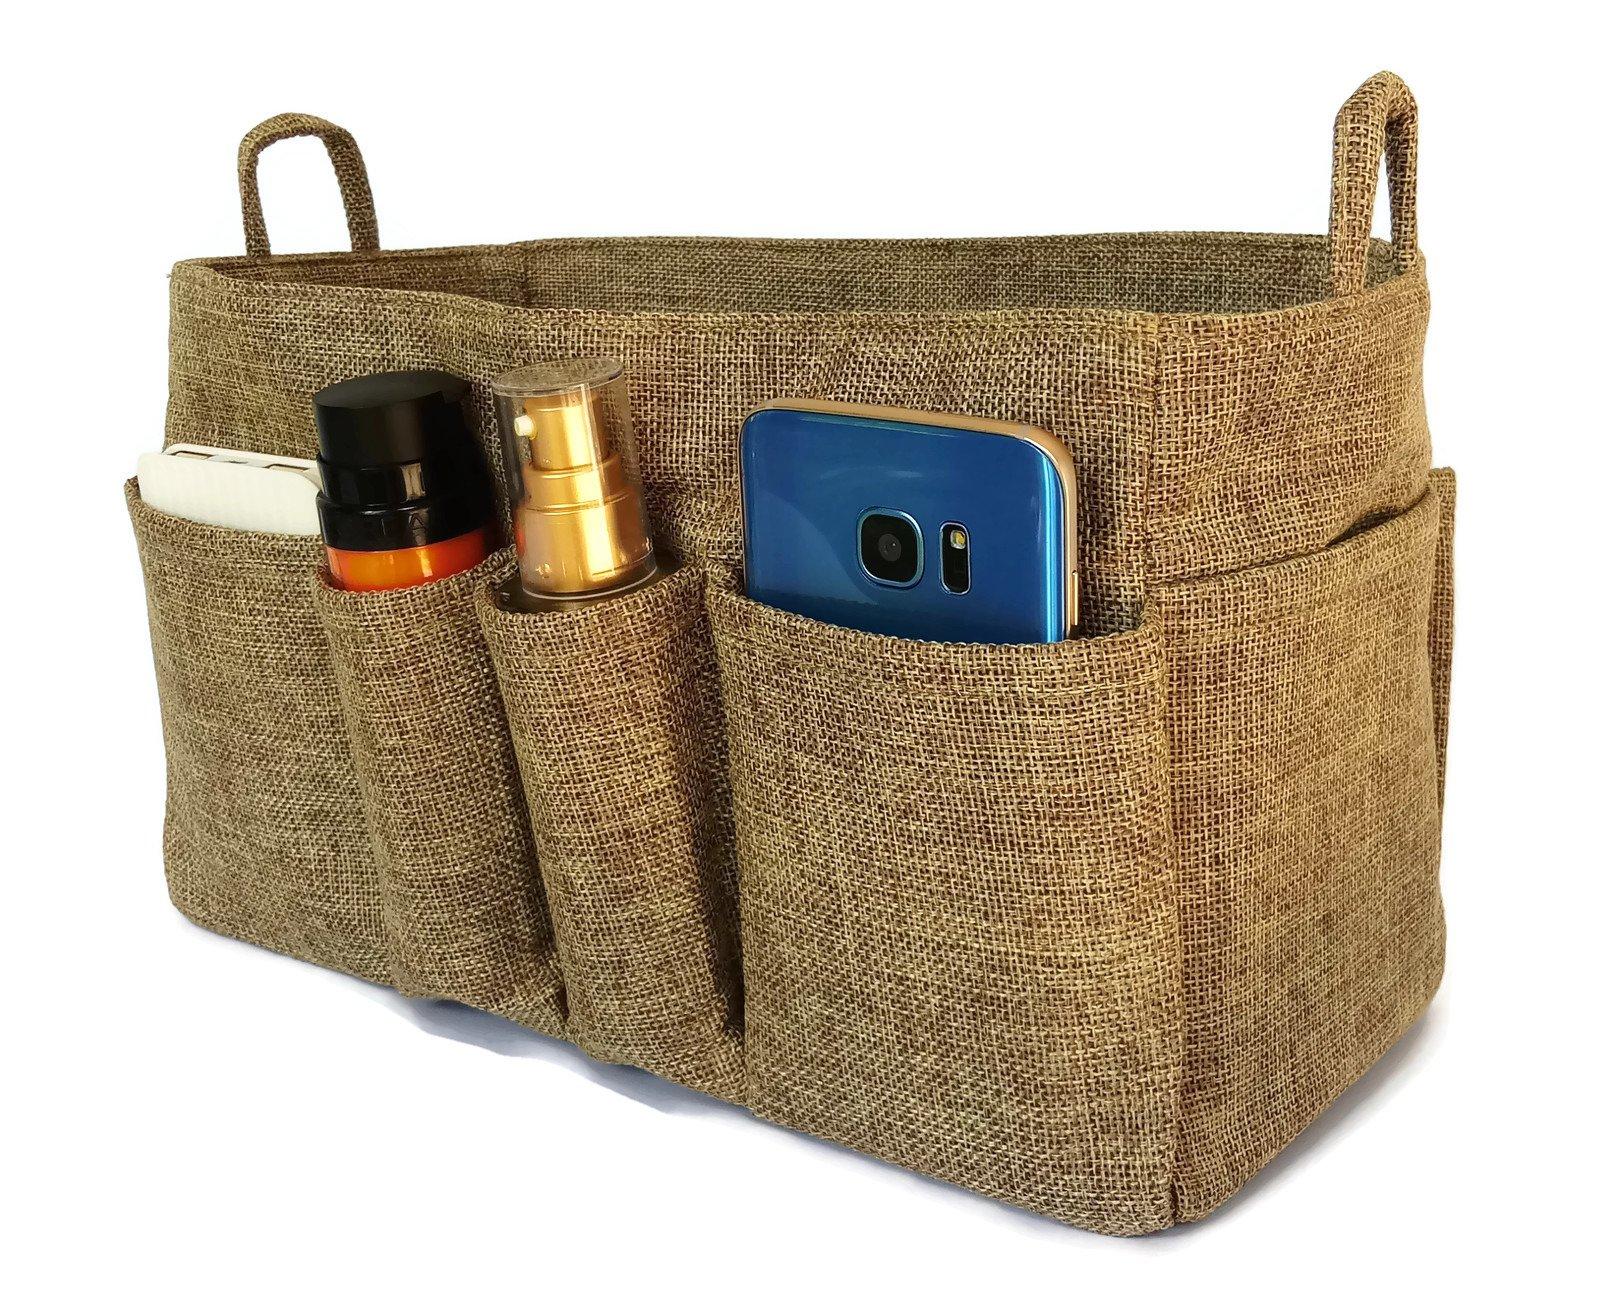 Large Purse Organize Insert, Tote Organizer, Handbag organizer : Large Size By K&M (Sand Brown)